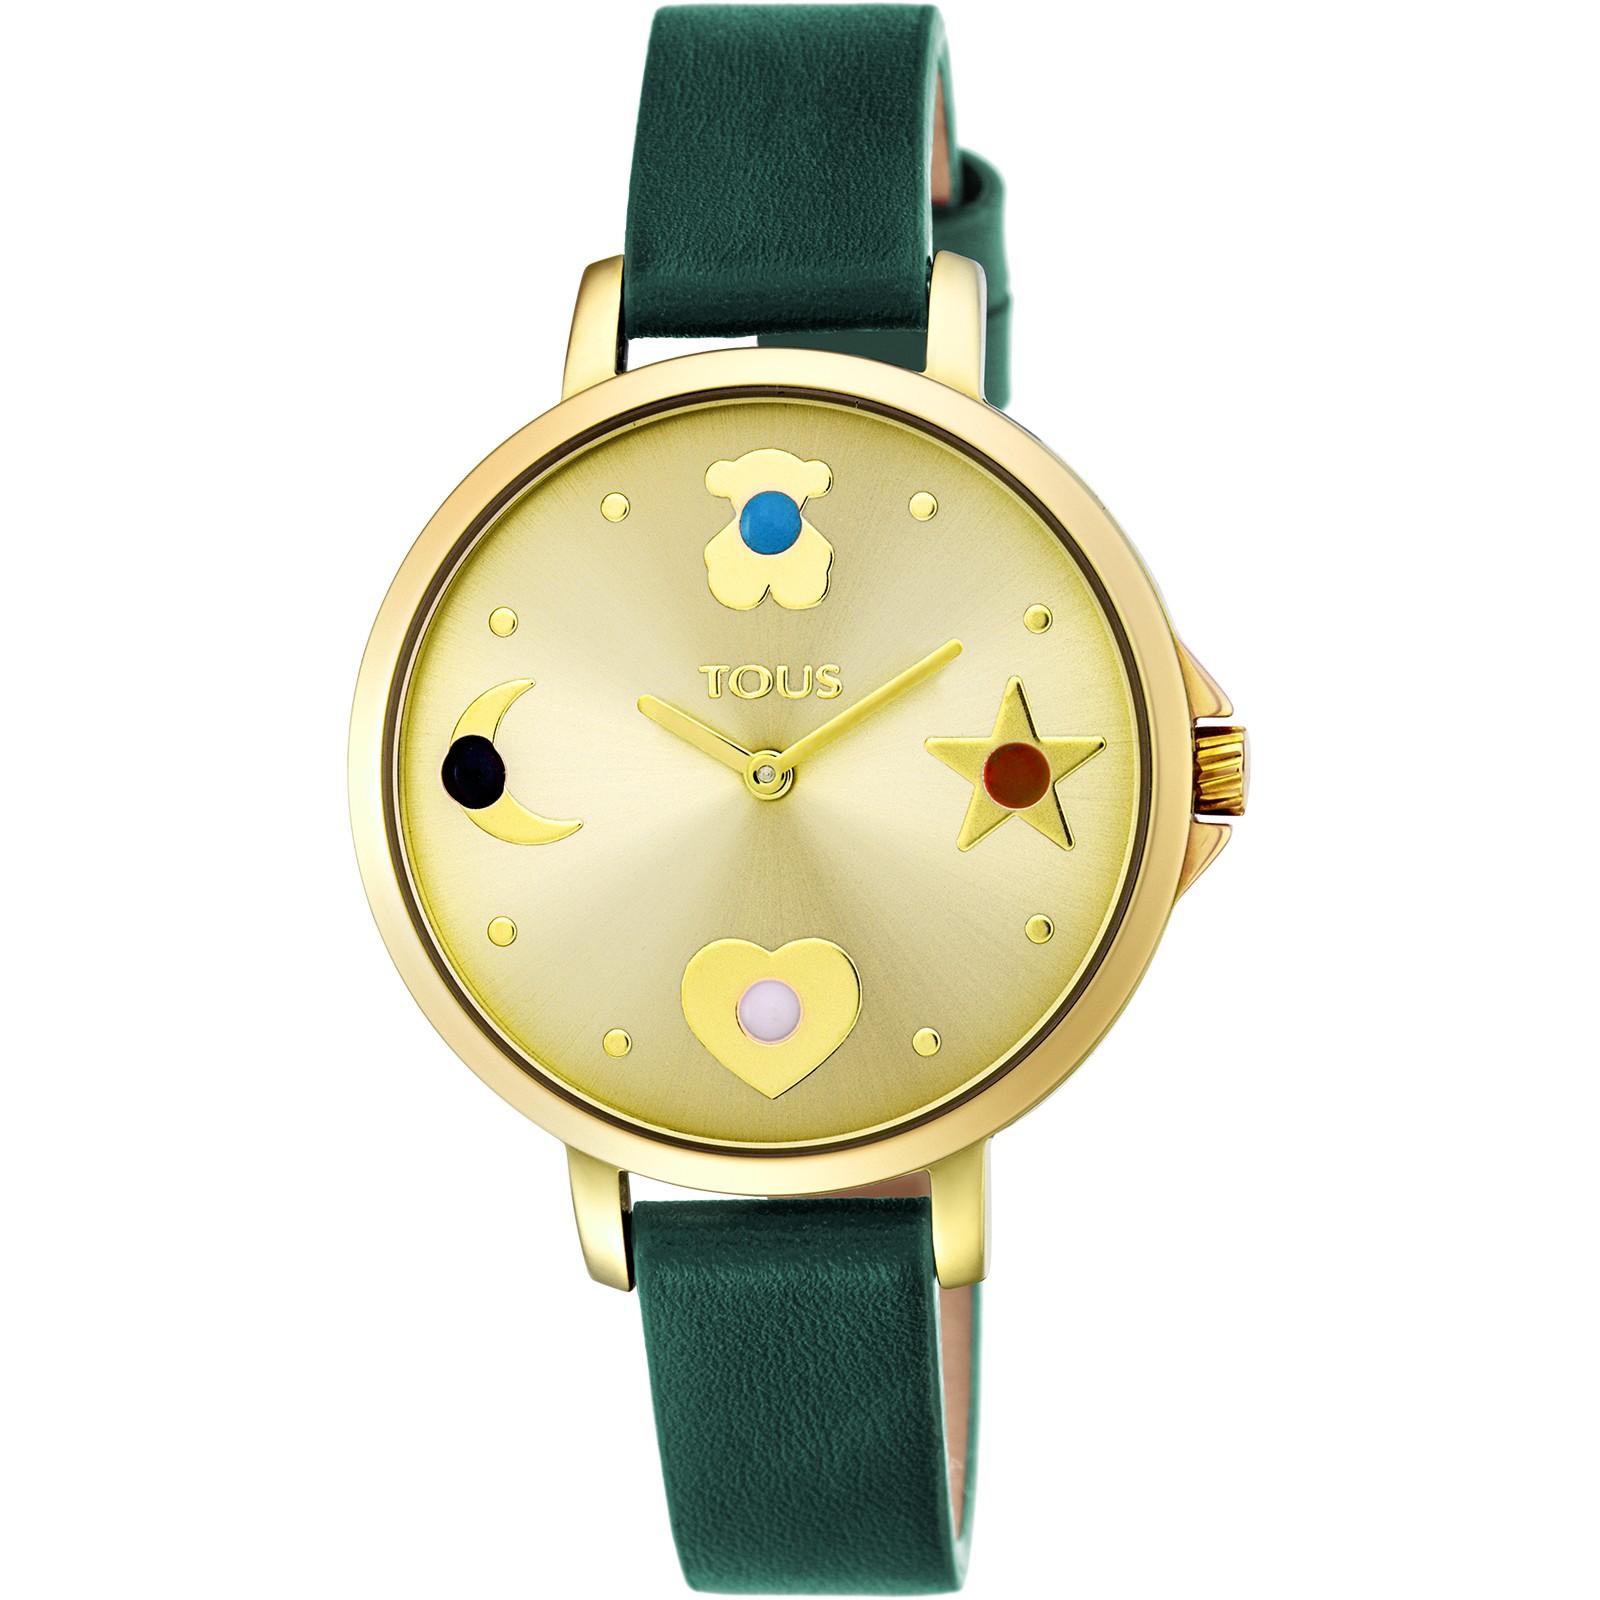 Reloj Super Power Verde-Dorado de Cuero Tous TTSPS - TDT (B)